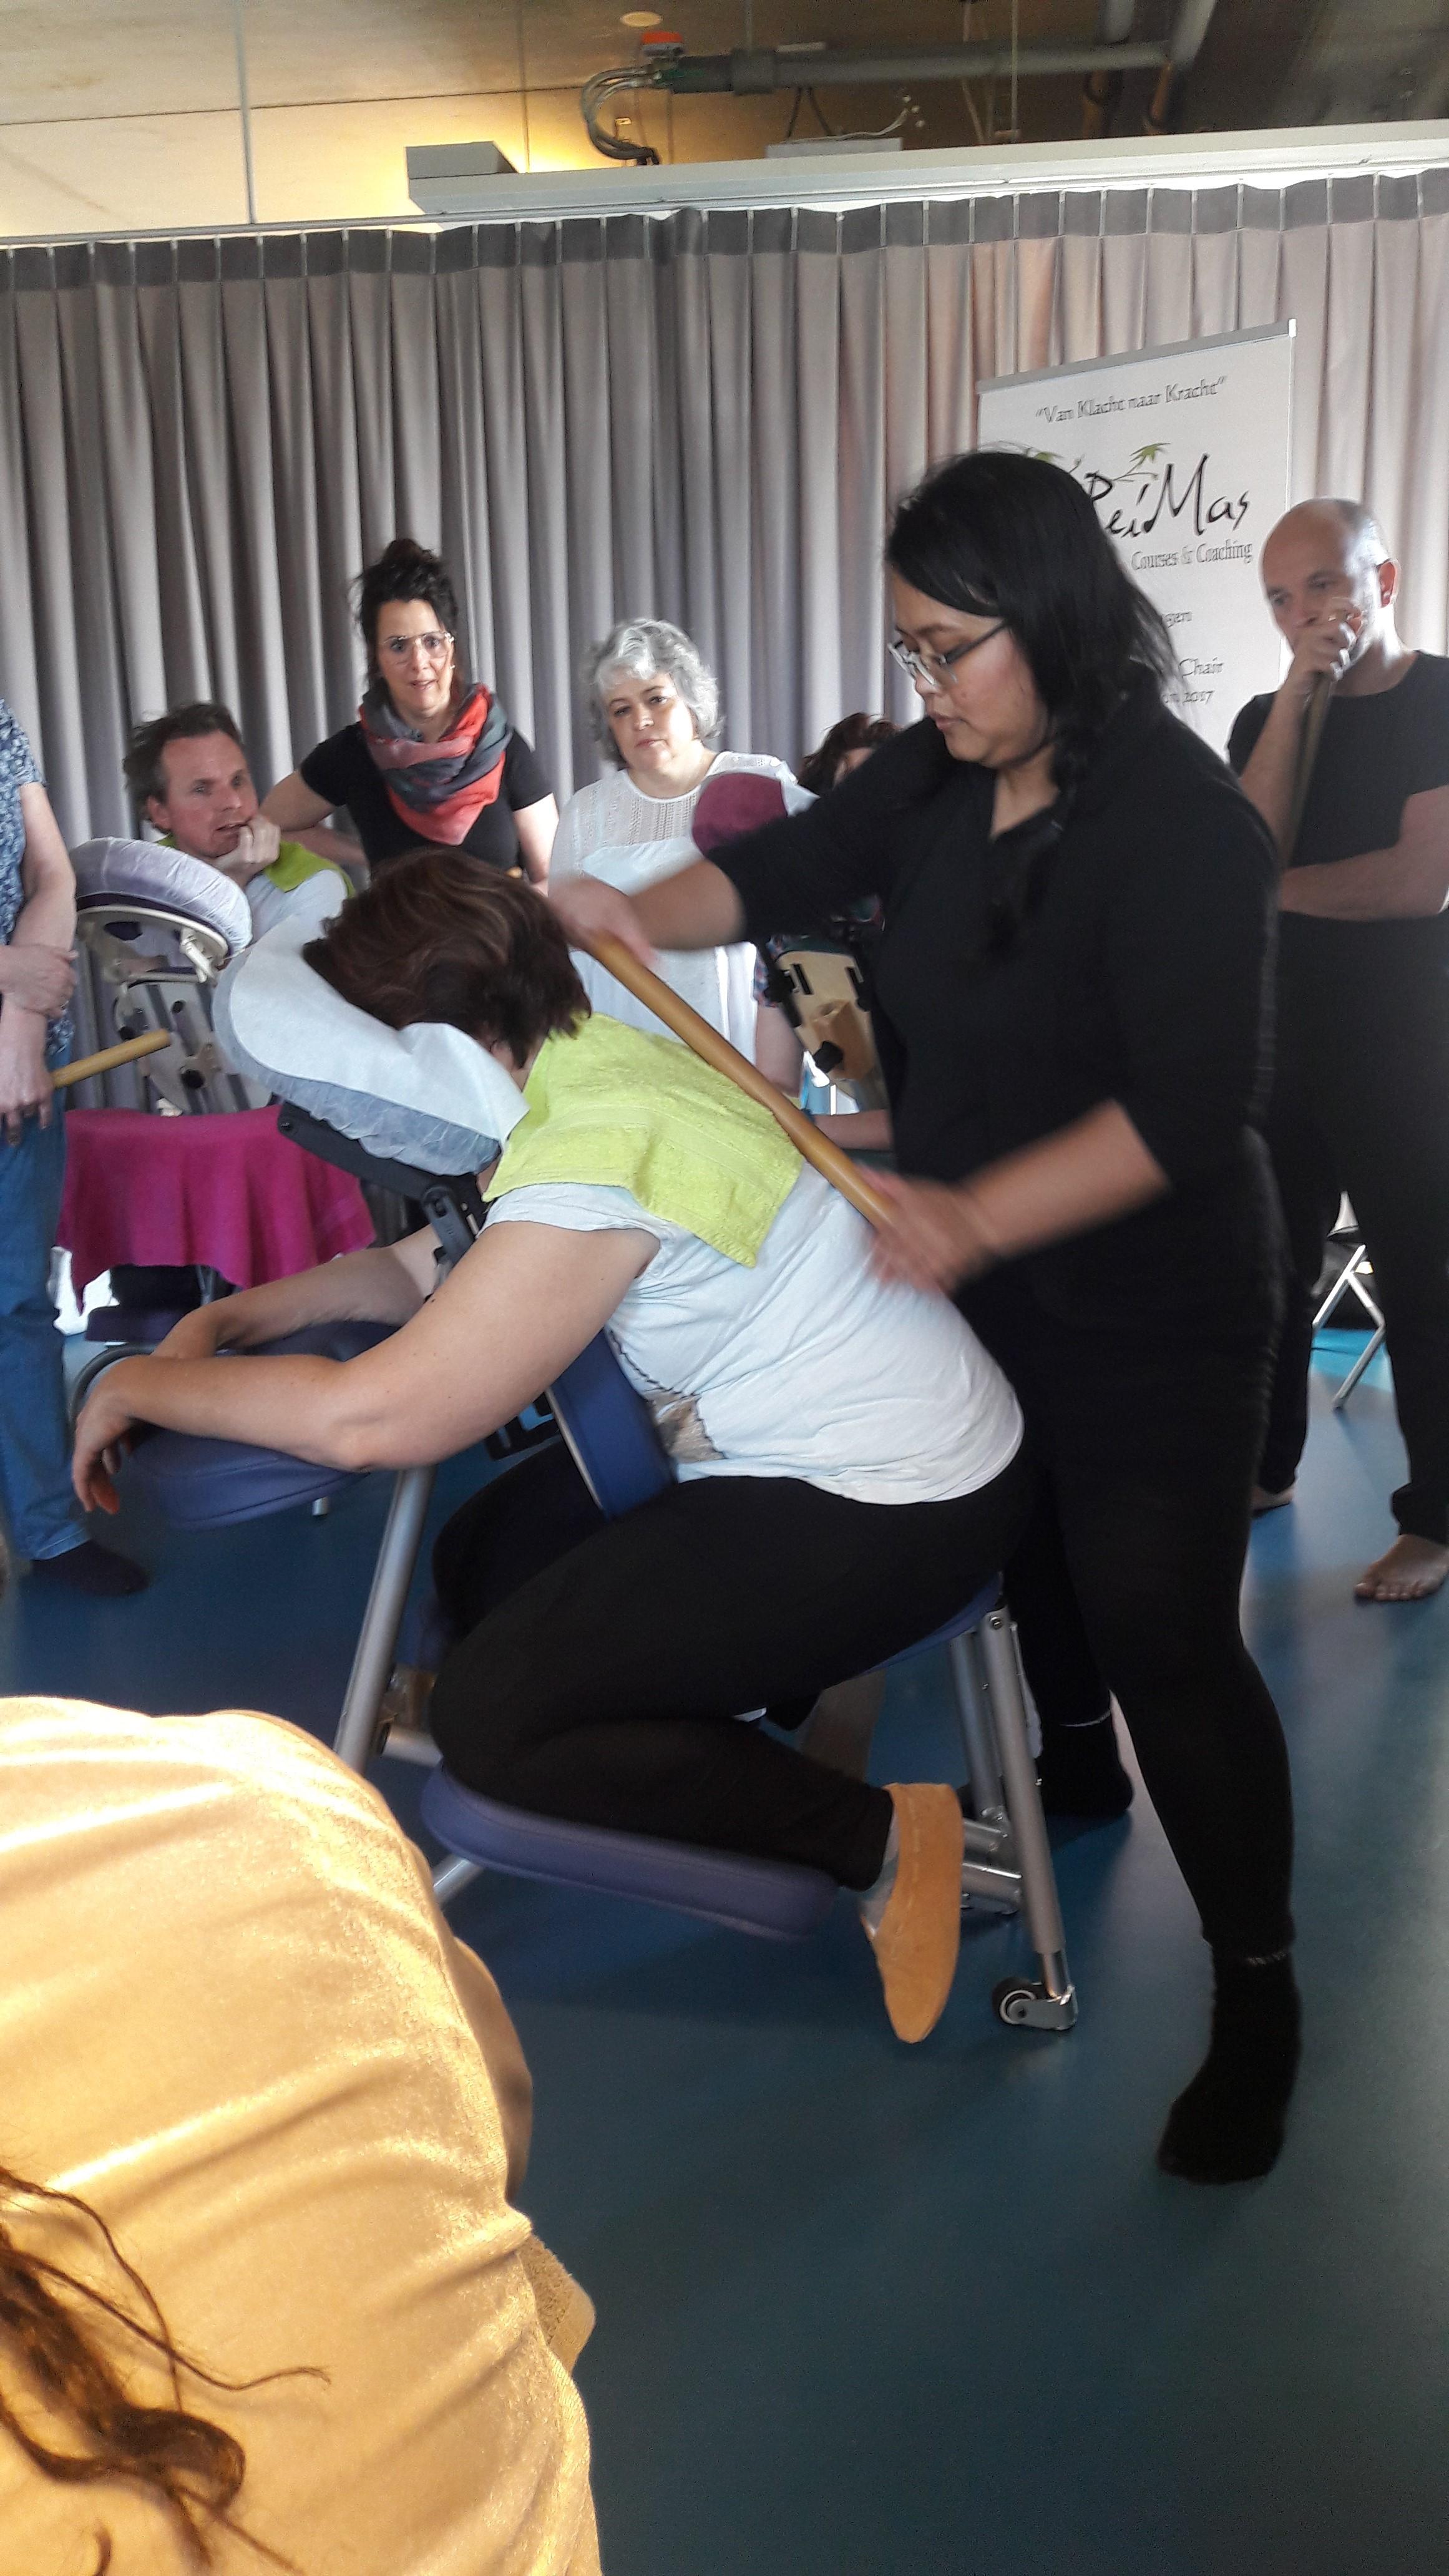 IMA gouden medaille winnares Christina Blei-Amatdoelrasit geeft in Nederland op diverse locaties cursussen workshops bamboemassage.